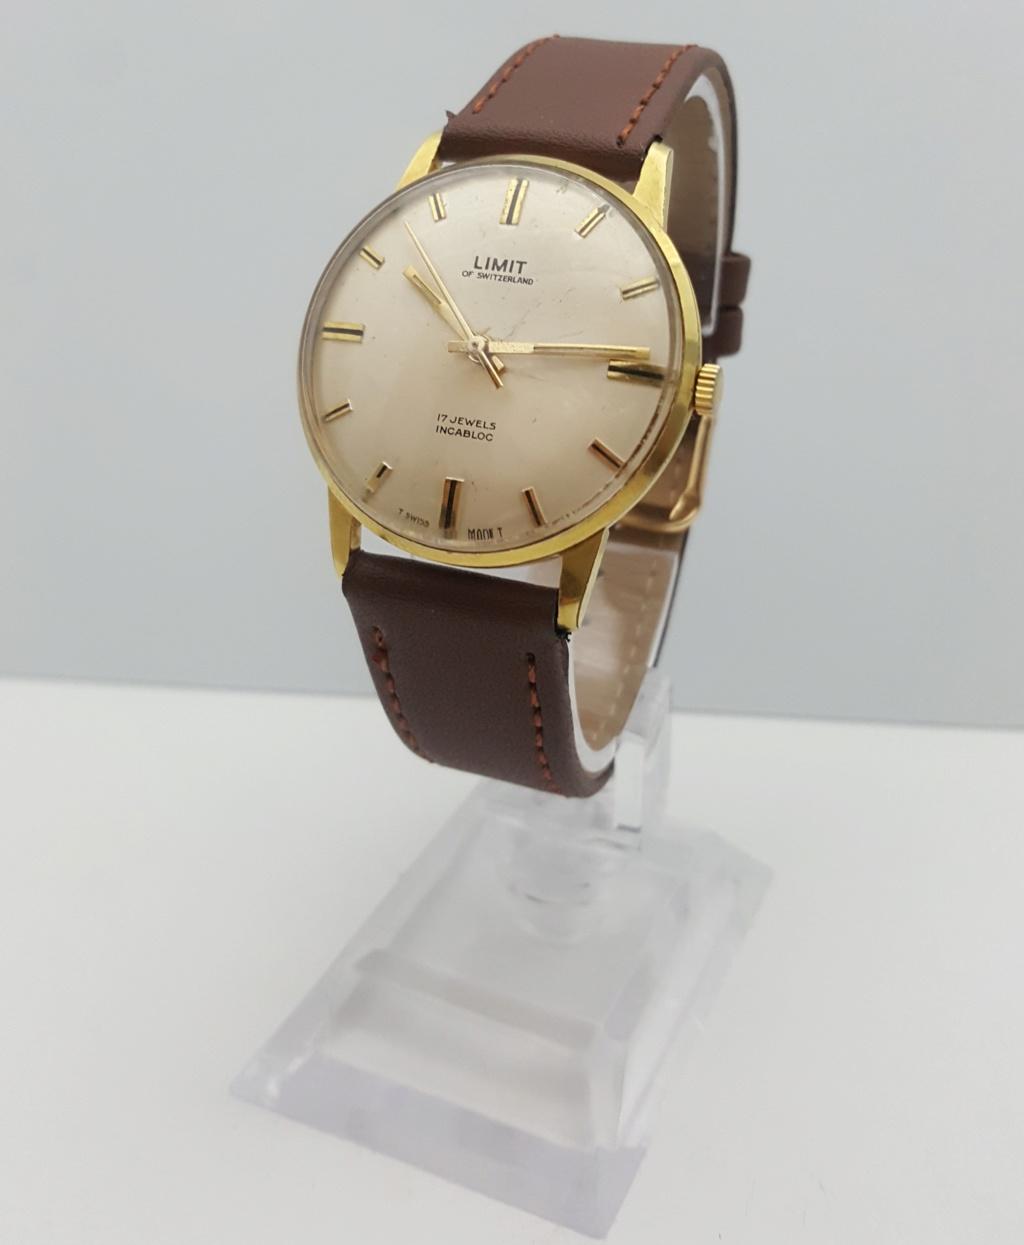 [Vendido] Relógio Vintage Limit - (FHF 97 - 17J) - c/ 34mm - Gold Plated G10 0120